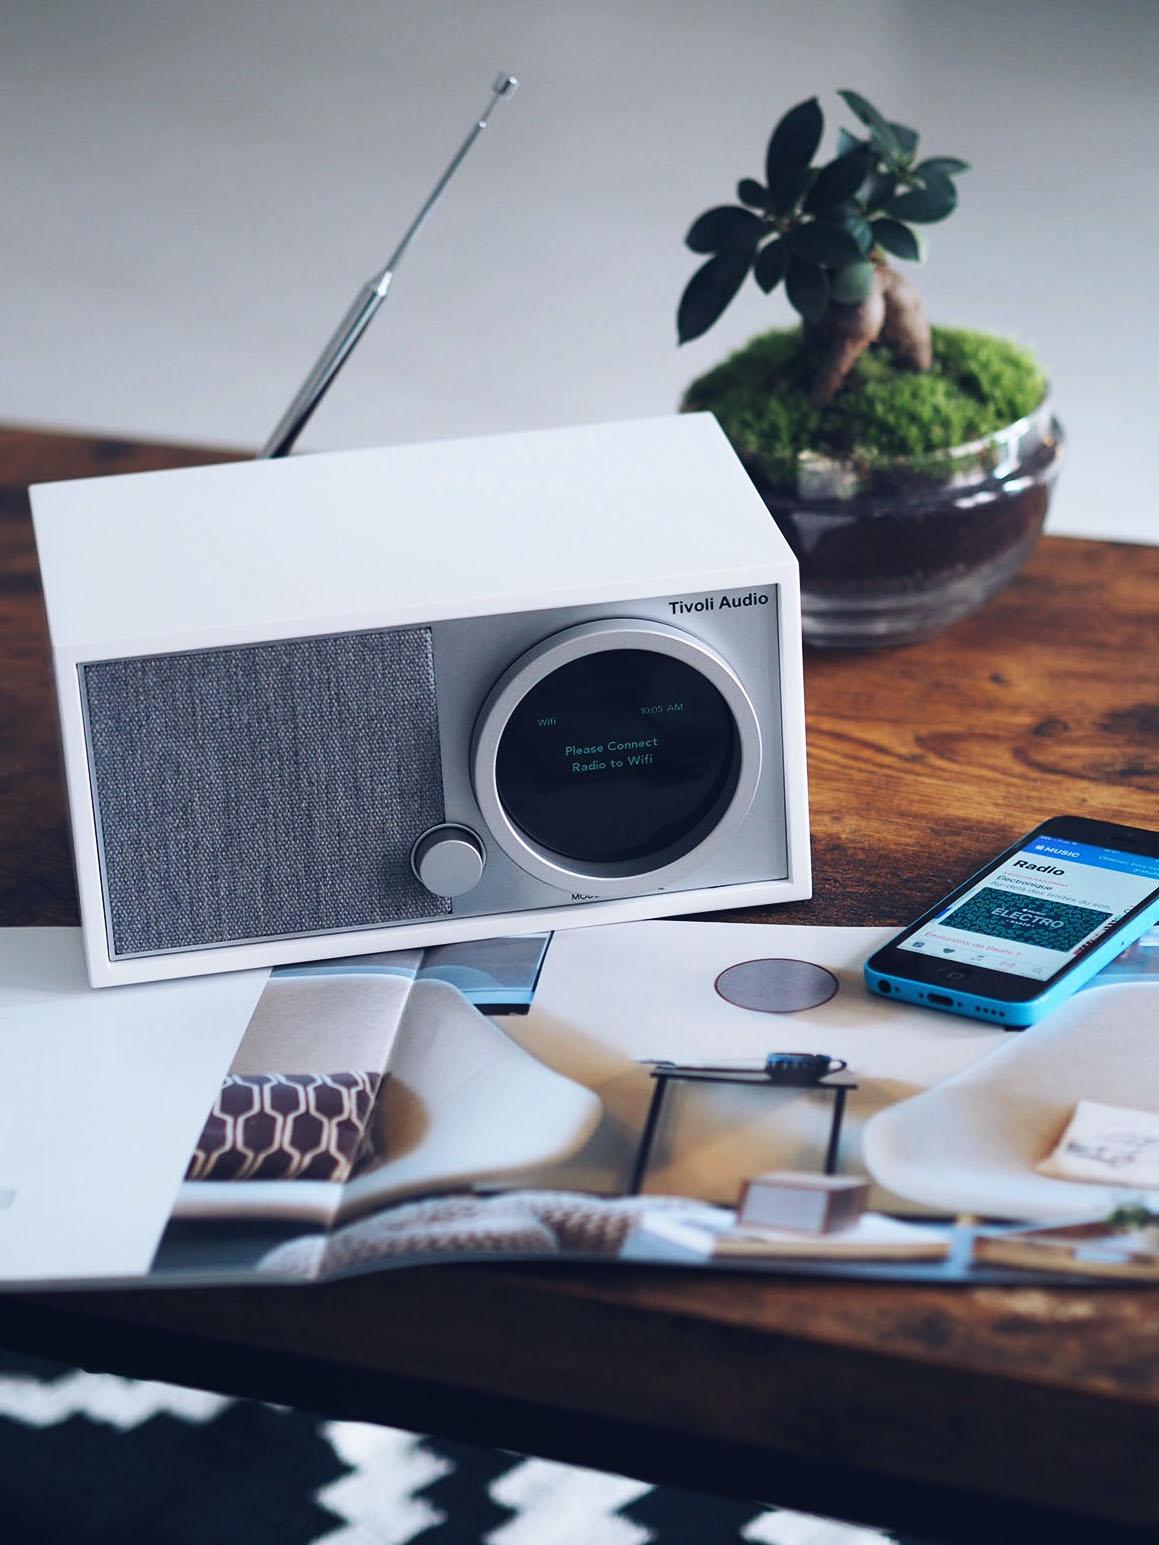 radio tivoli audio la minute fashion by melody. Black Bedroom Furniture Sets. Home Design Ideas